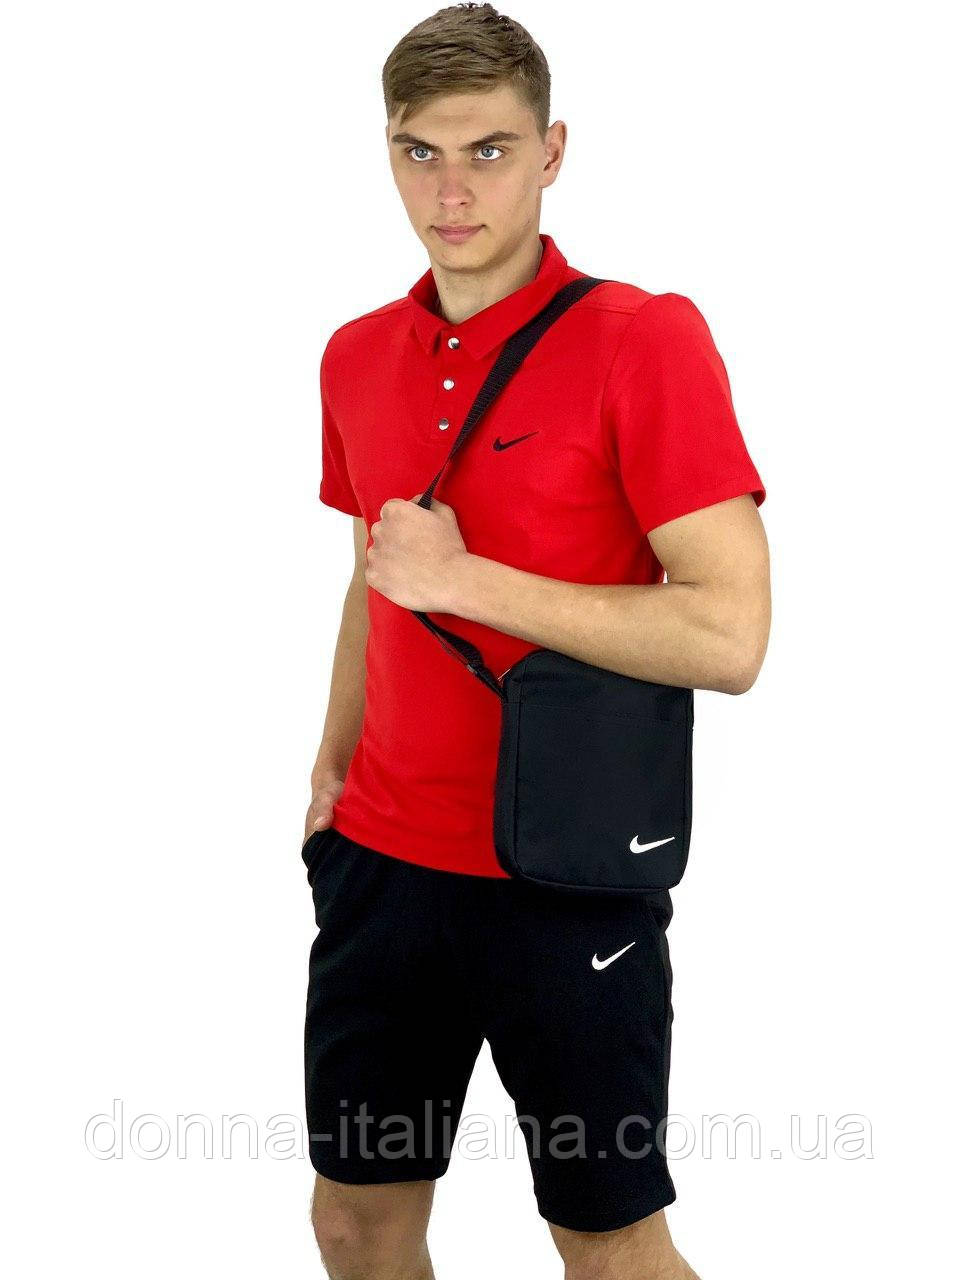 Комплект Футболка Polo+ Шорты+ Барсетка Nike Реплика XXL Красно-черный (KomNikeRed1/5)